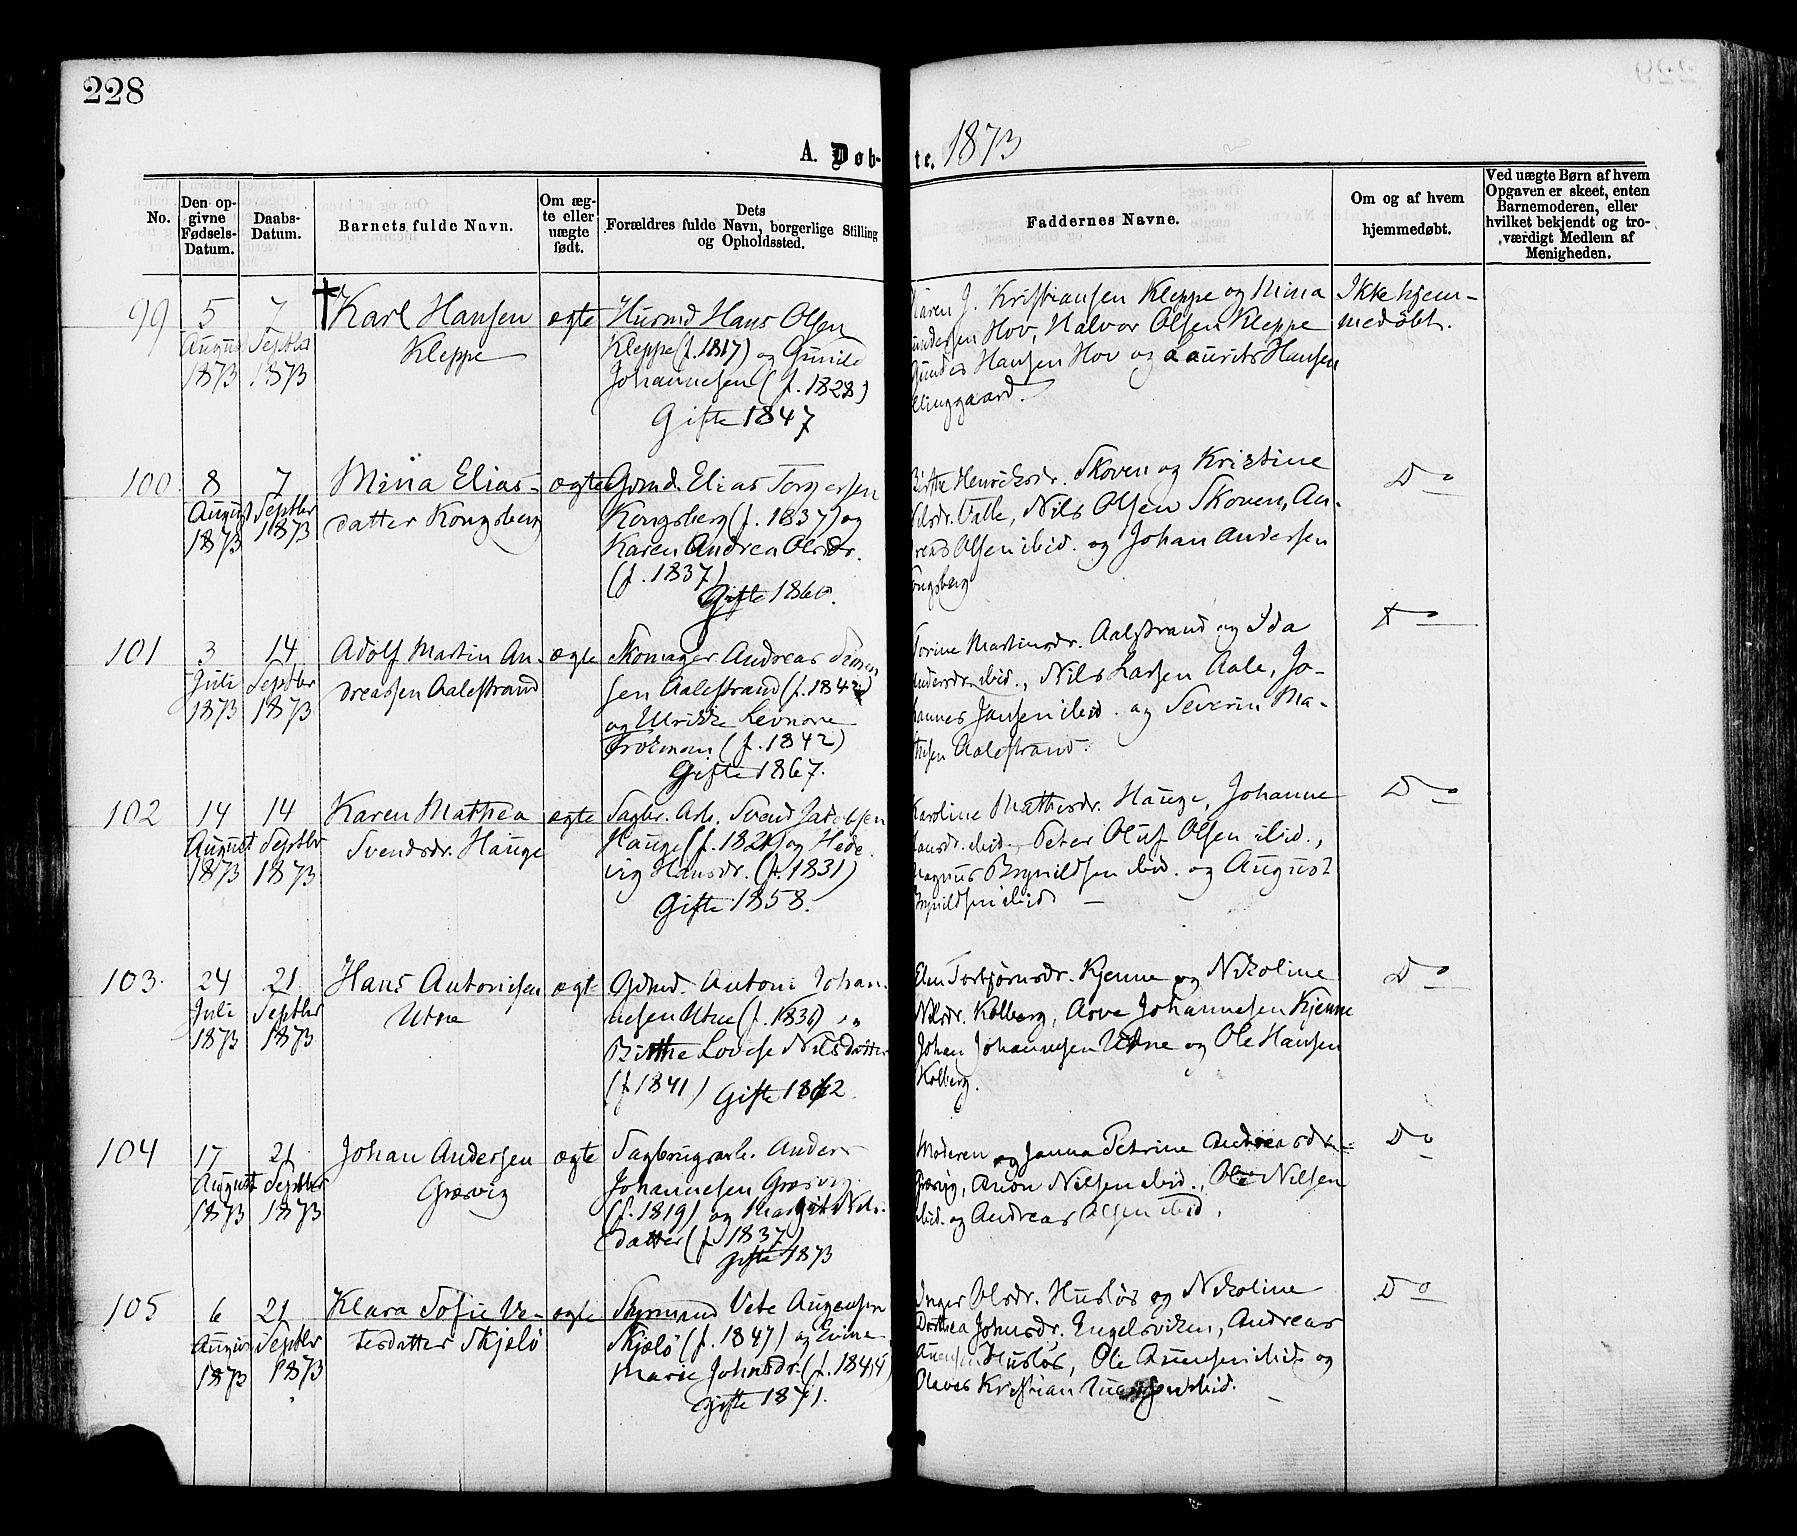 SAO, Onsøy prestekontor Kirkebøker, F/Fa/L0004: Ministerialbok nr. I 4, 1861-1877, s. 228